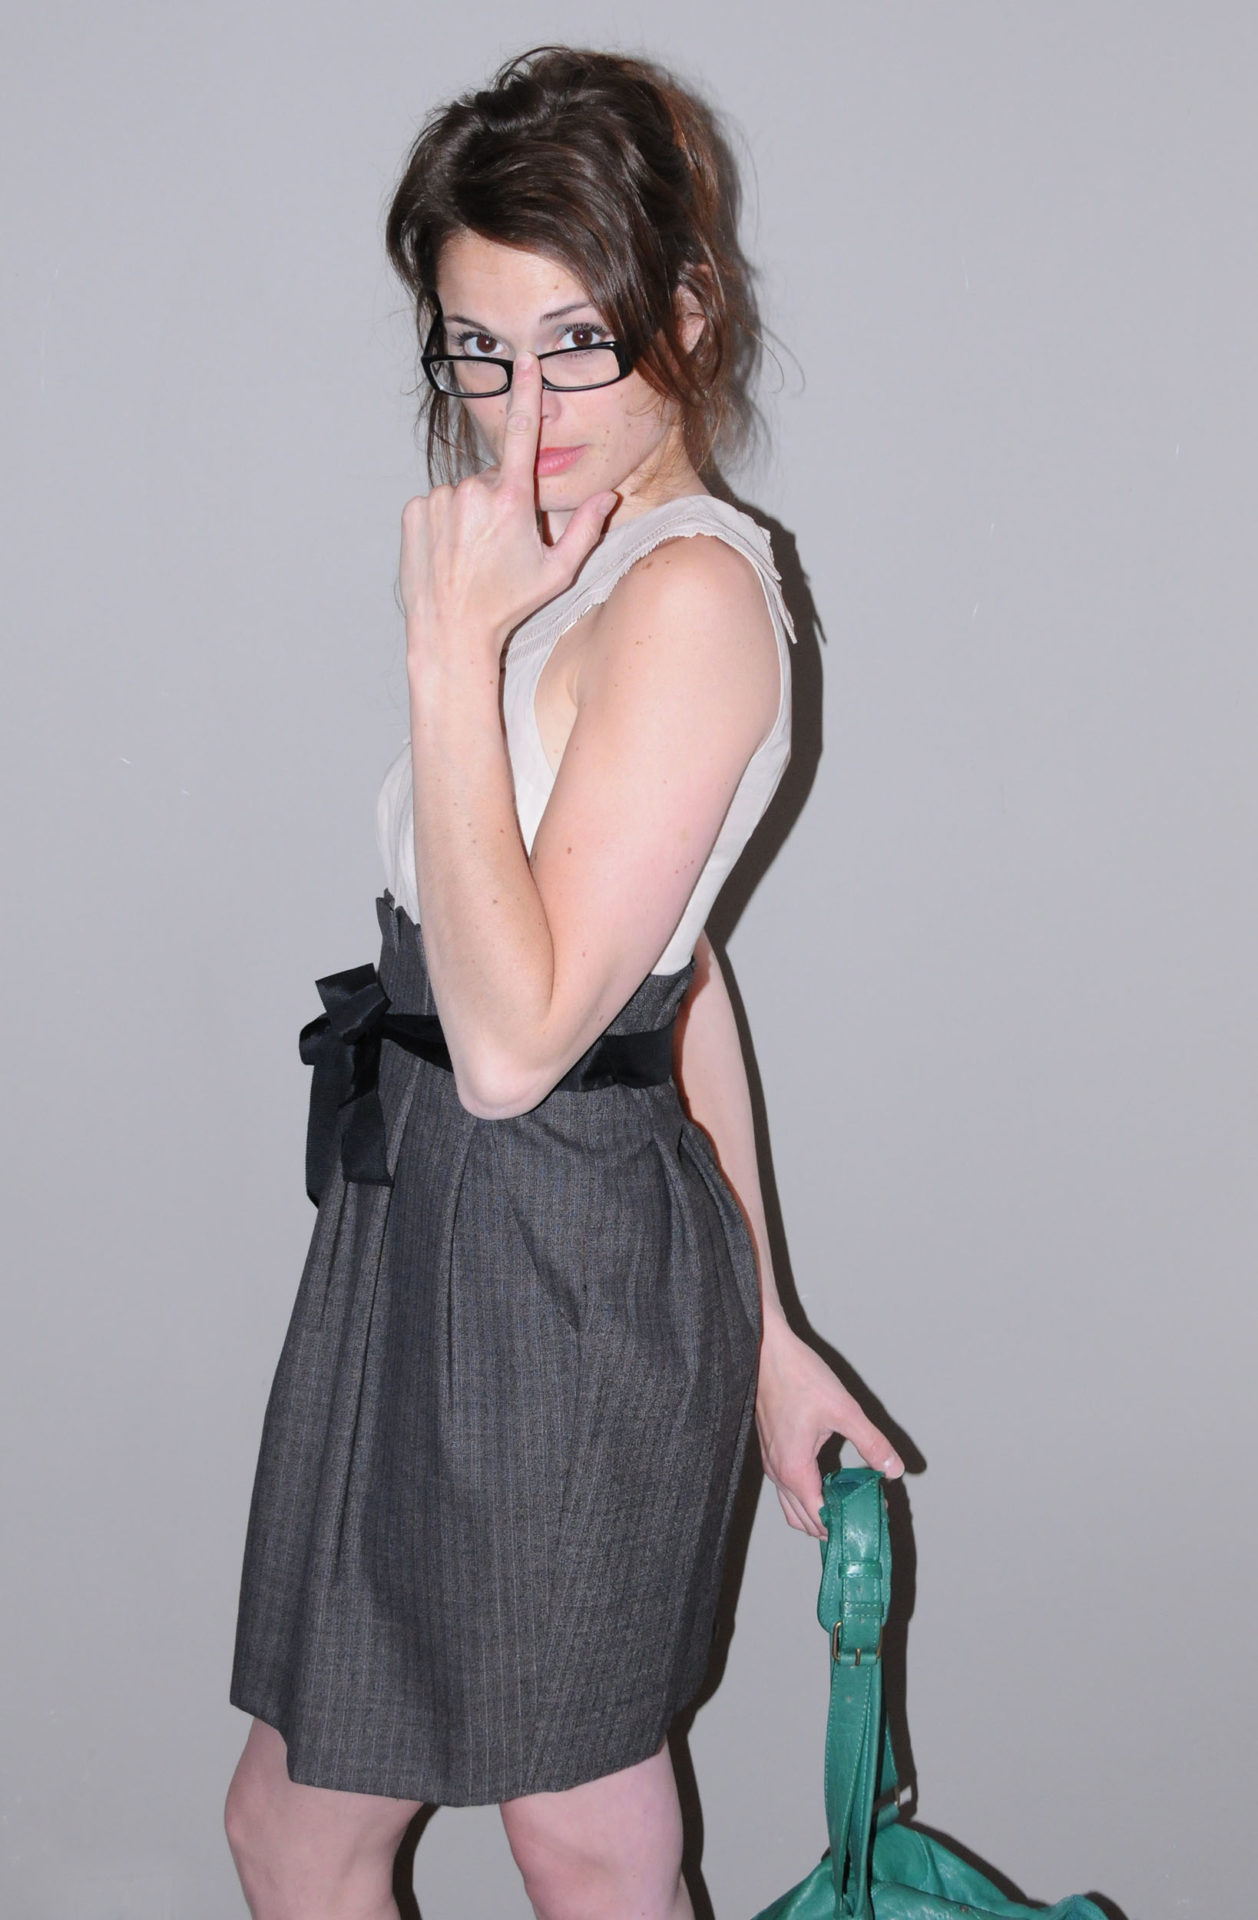 Audrey-Scavone-laurent-scavone-7